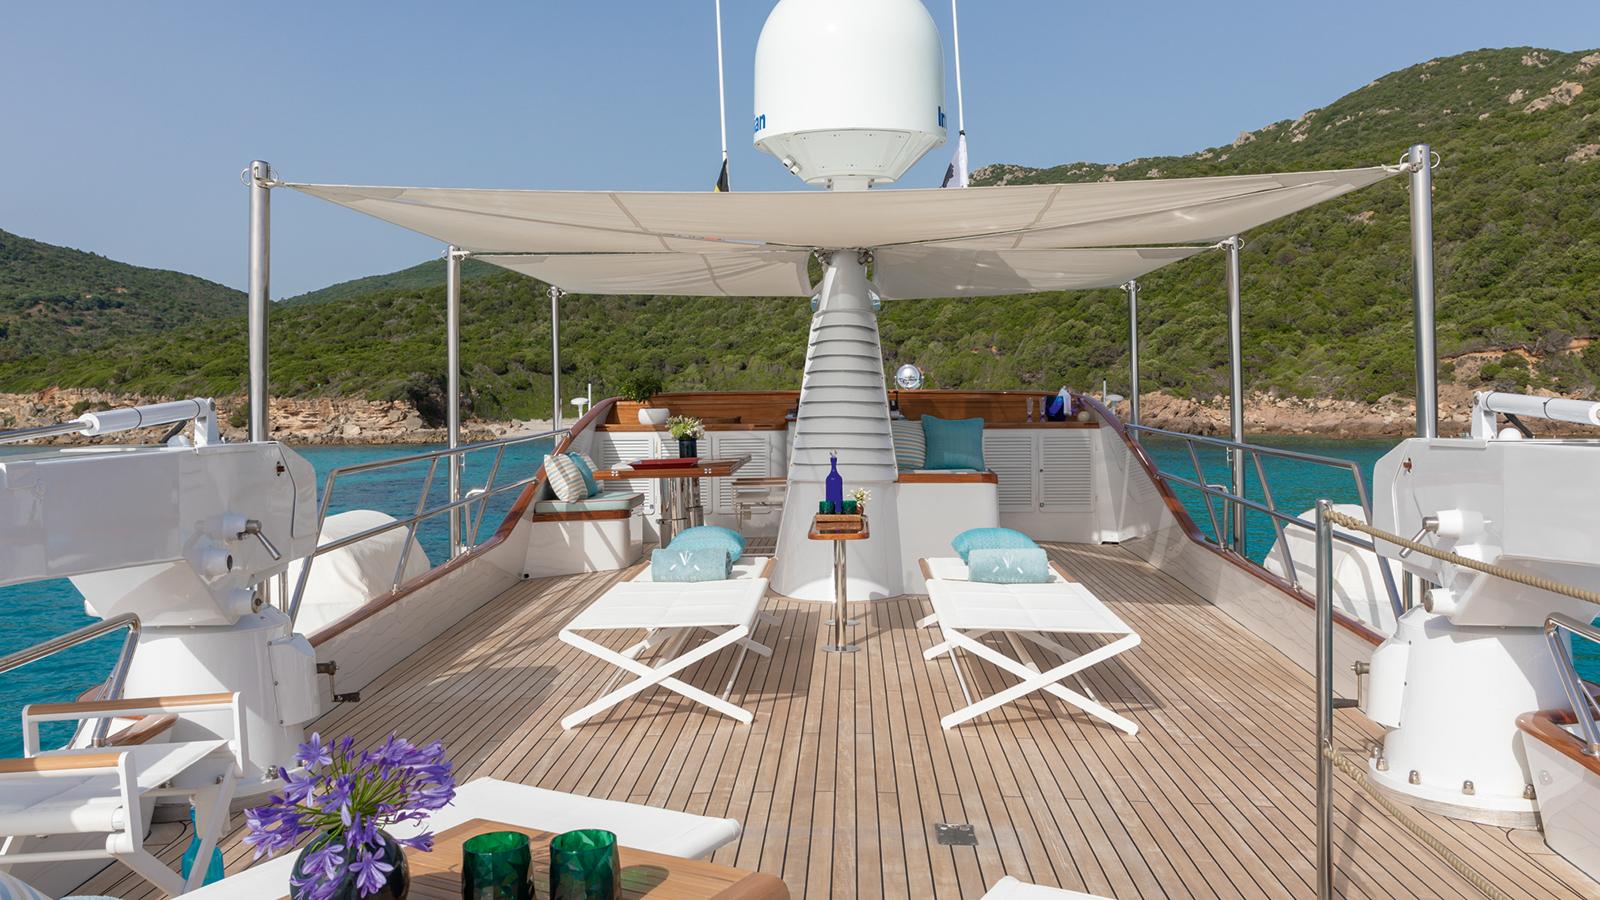 carlo-riva-classic-motor-yacht-vespucci-sun-deck